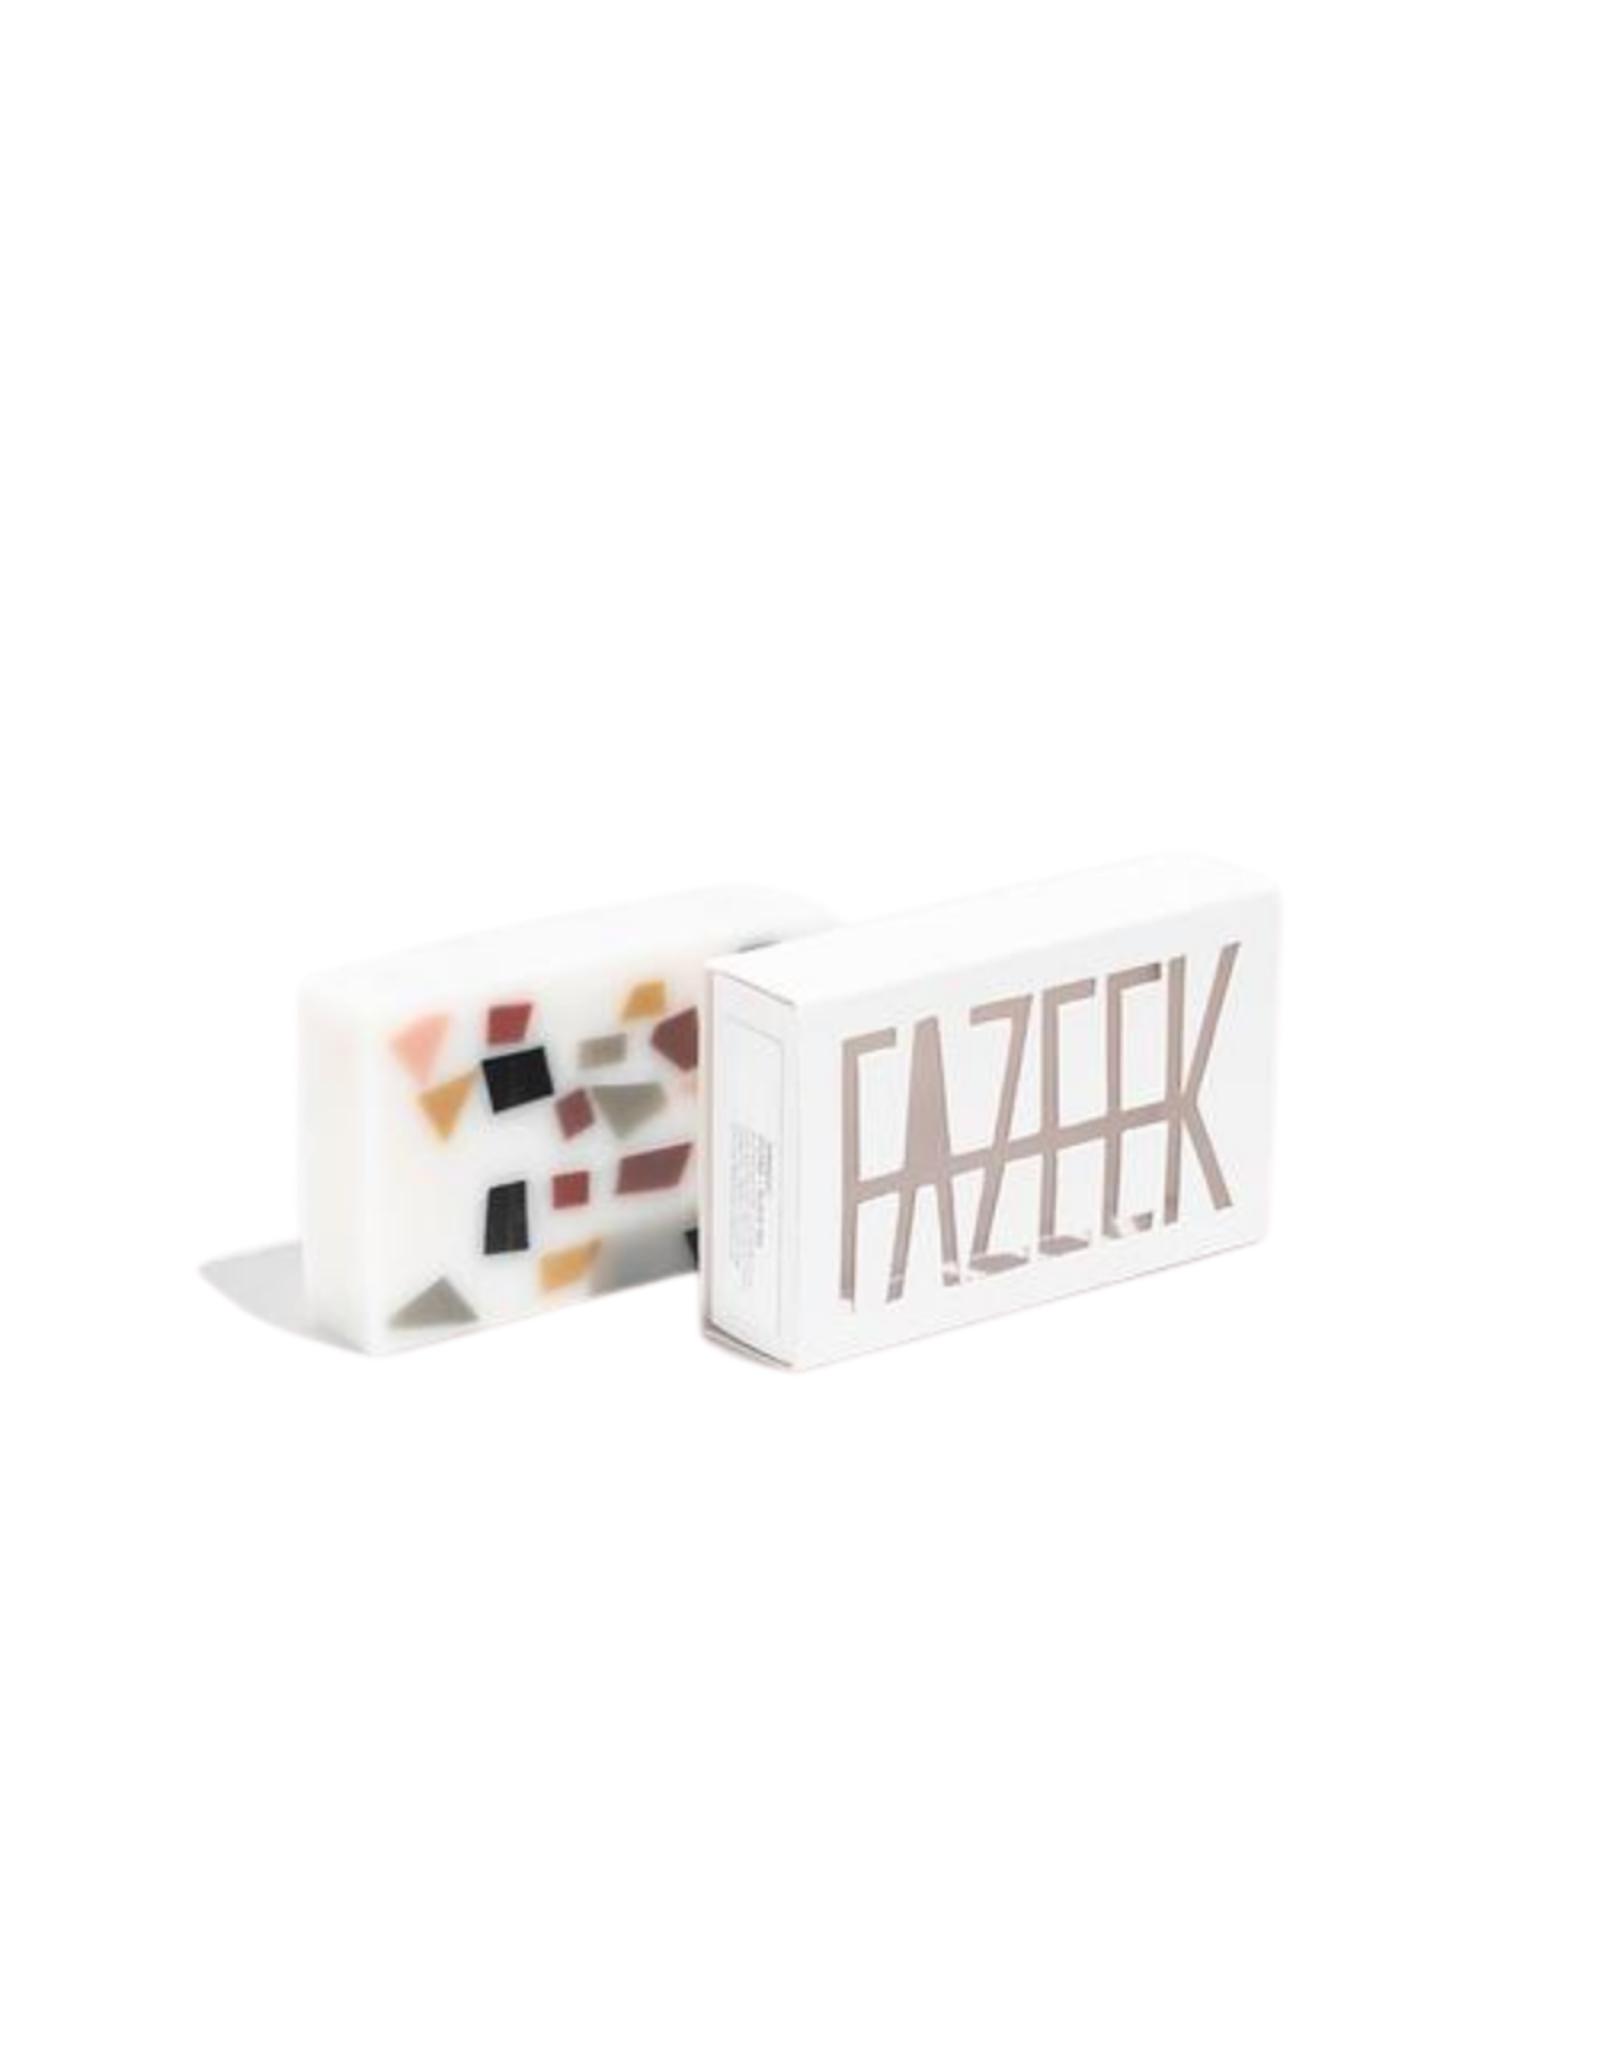 Fazeek Terrazzo Soap - Lychee+Black Tea